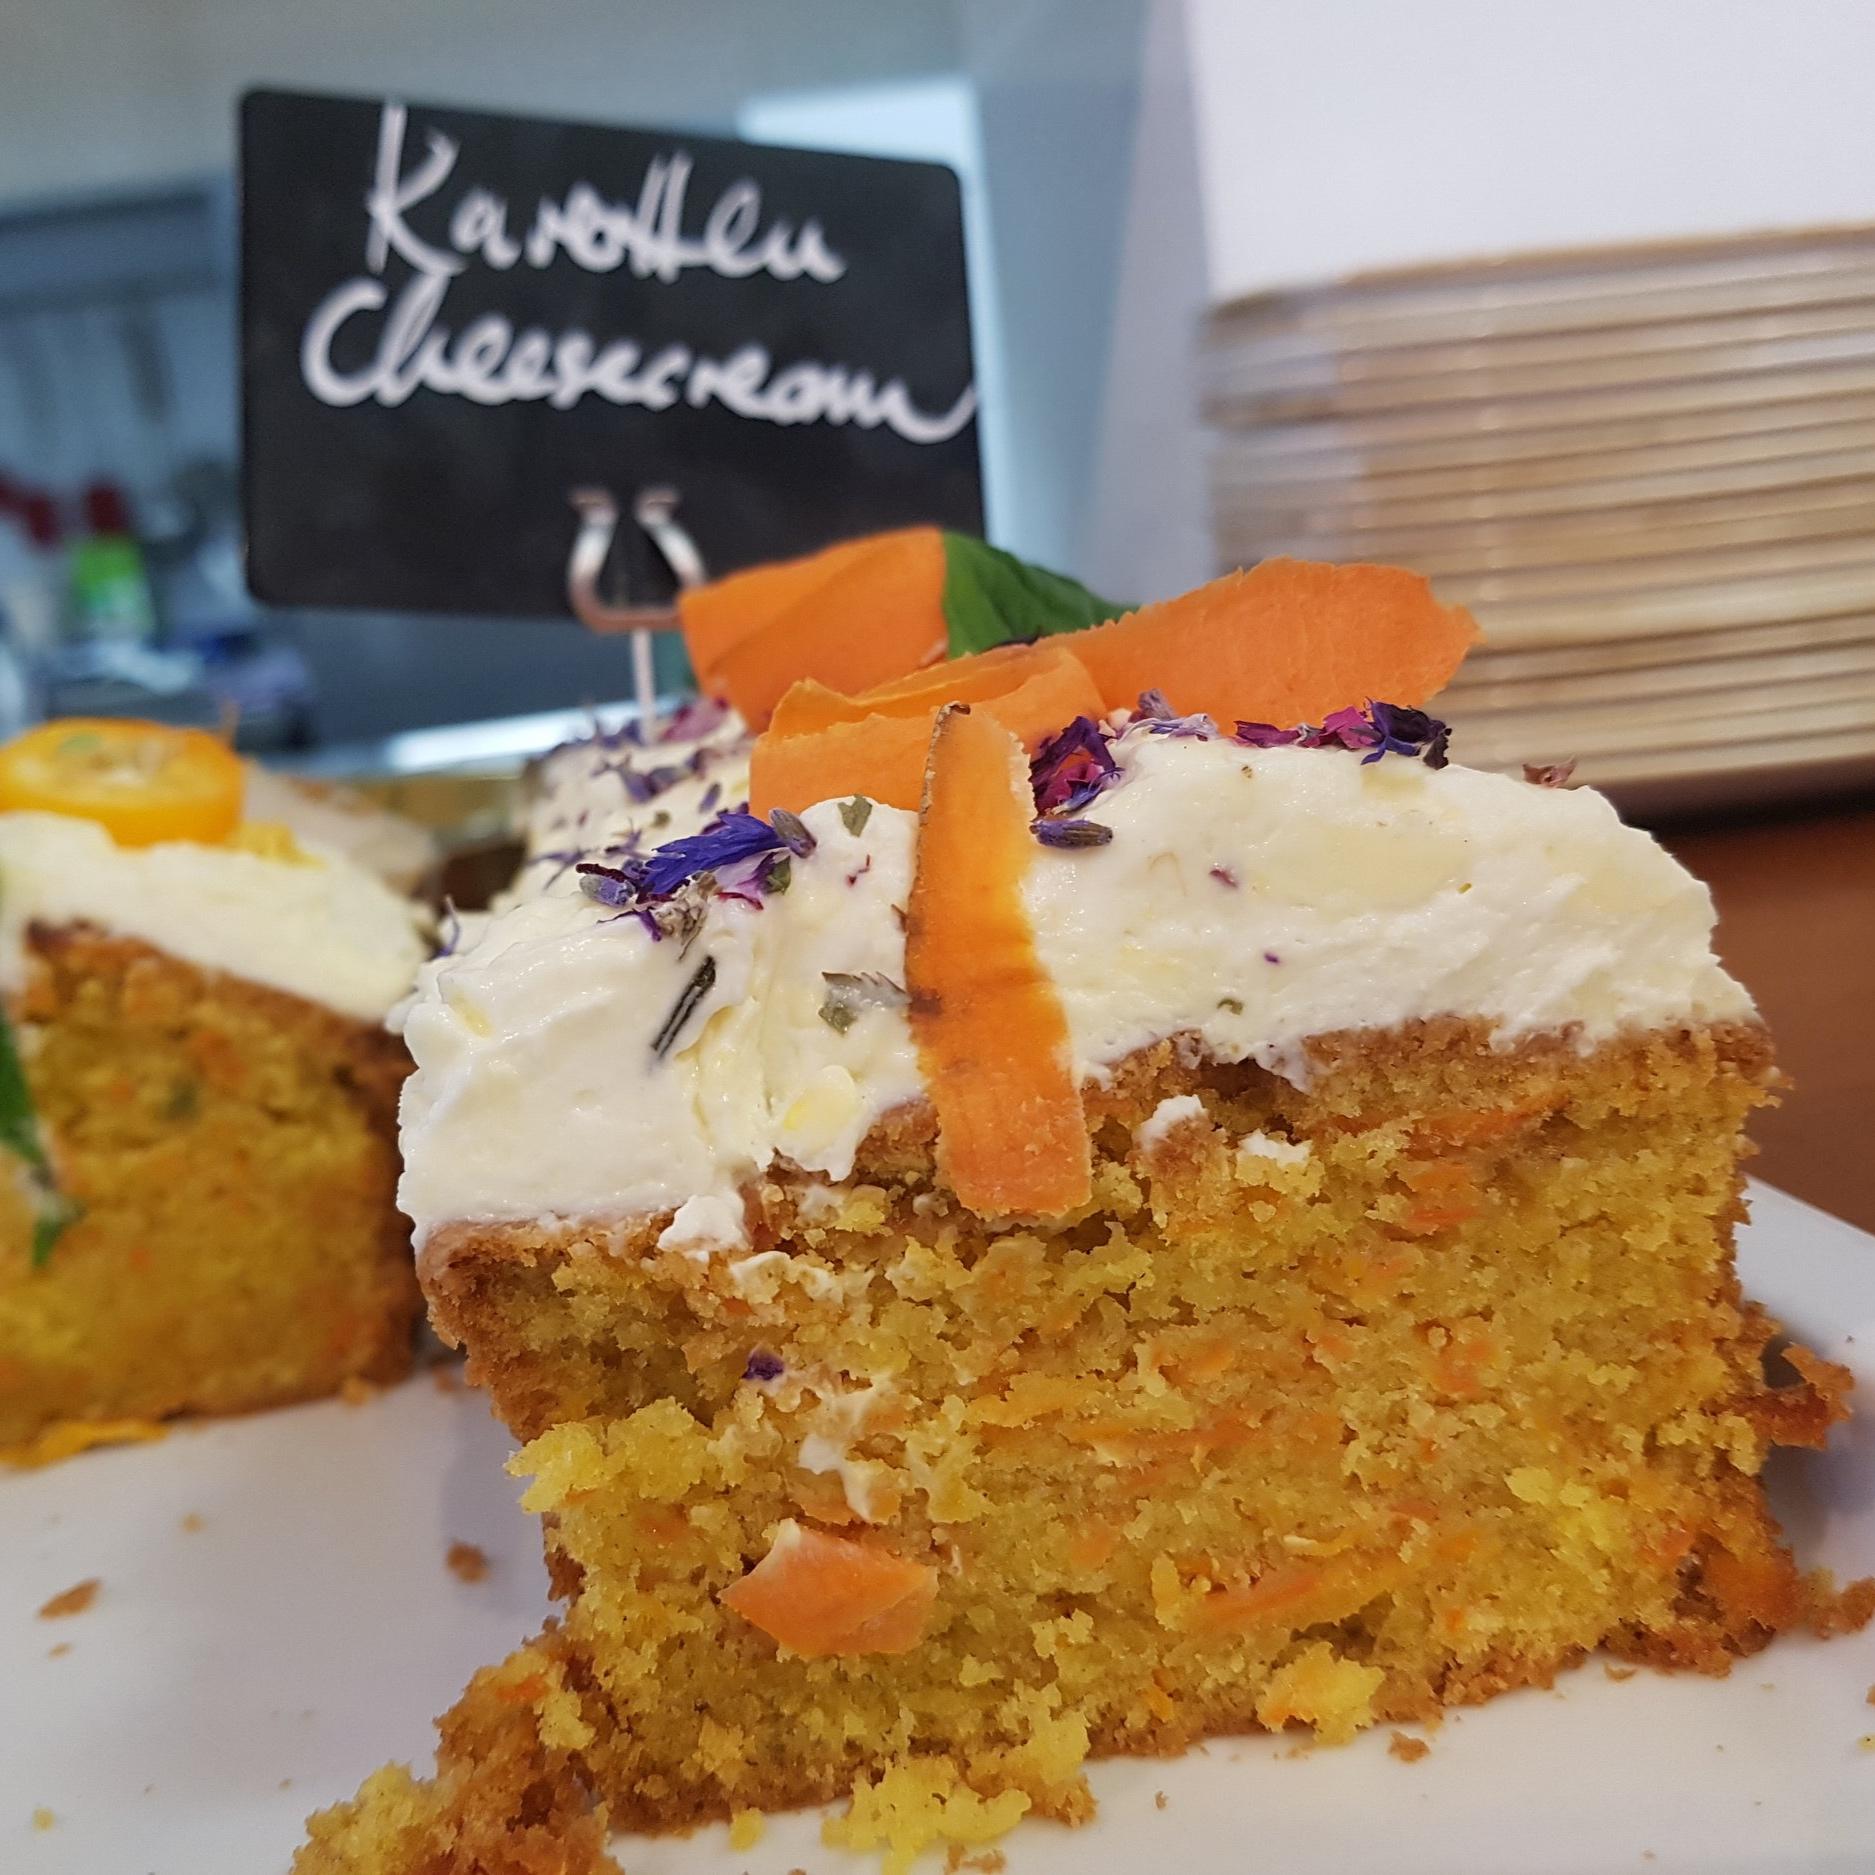 Kuchen-Café-Avalon, Karotten Cheesecream